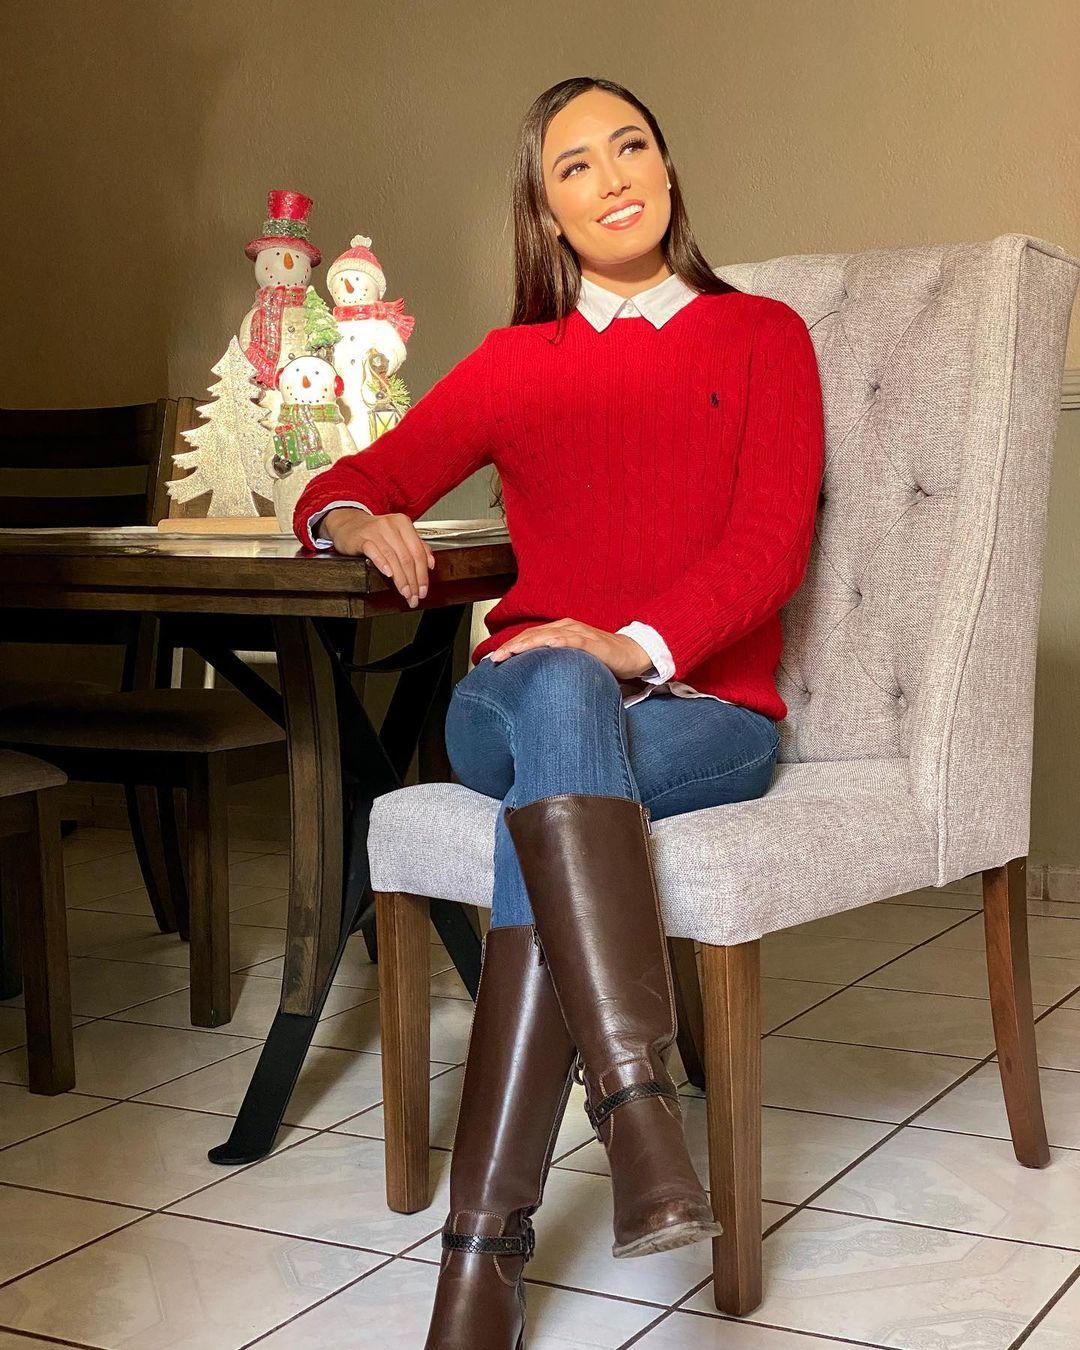 karolina vidales, candidata a miss mexico 2021, representando michoacan. - Página 10 Wuzm210